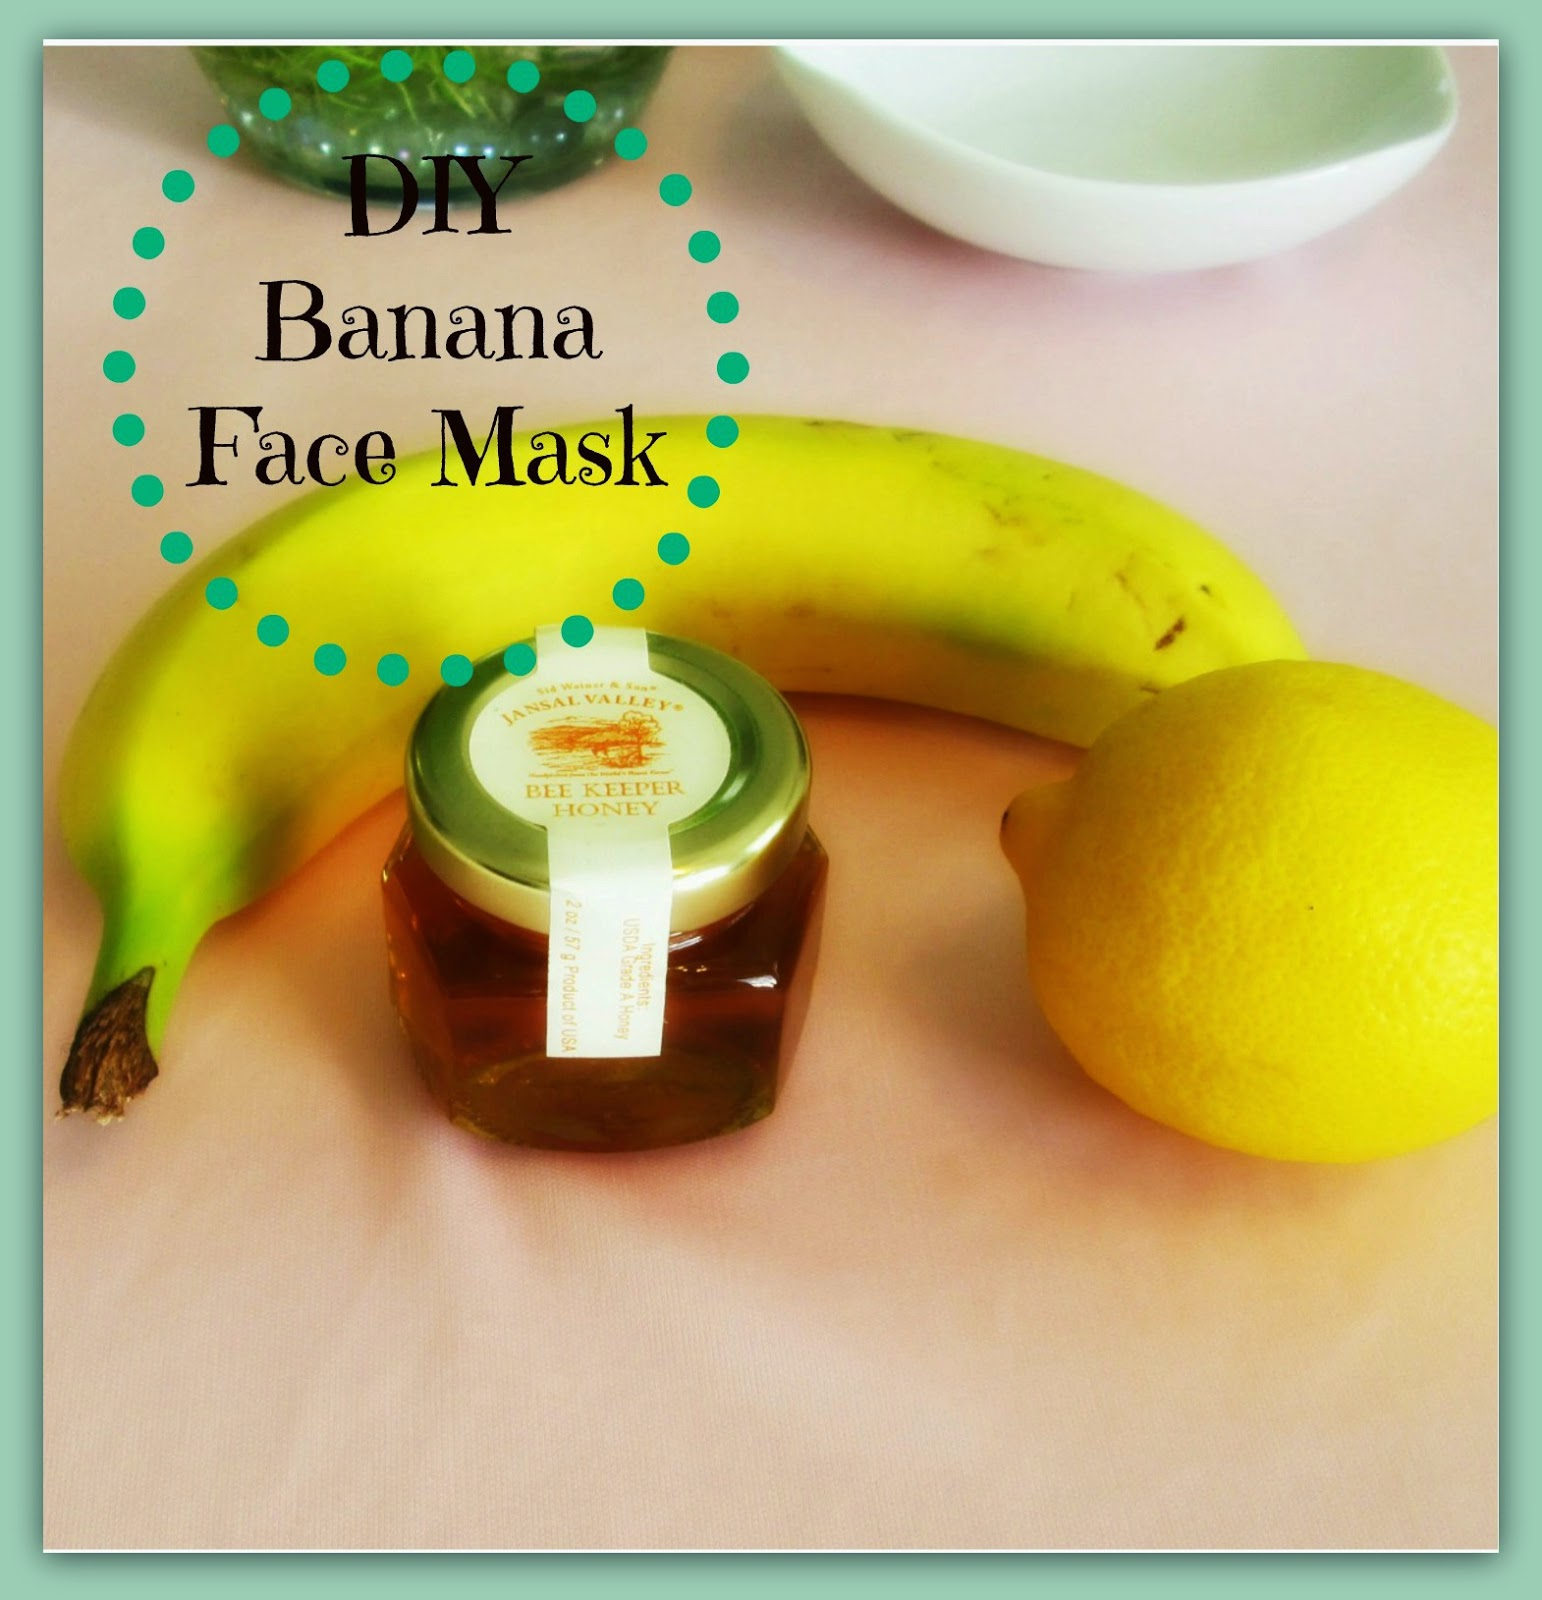 http://chrysalisglam101.blogspot.com/2015/01/diy-banana-face-mask.html